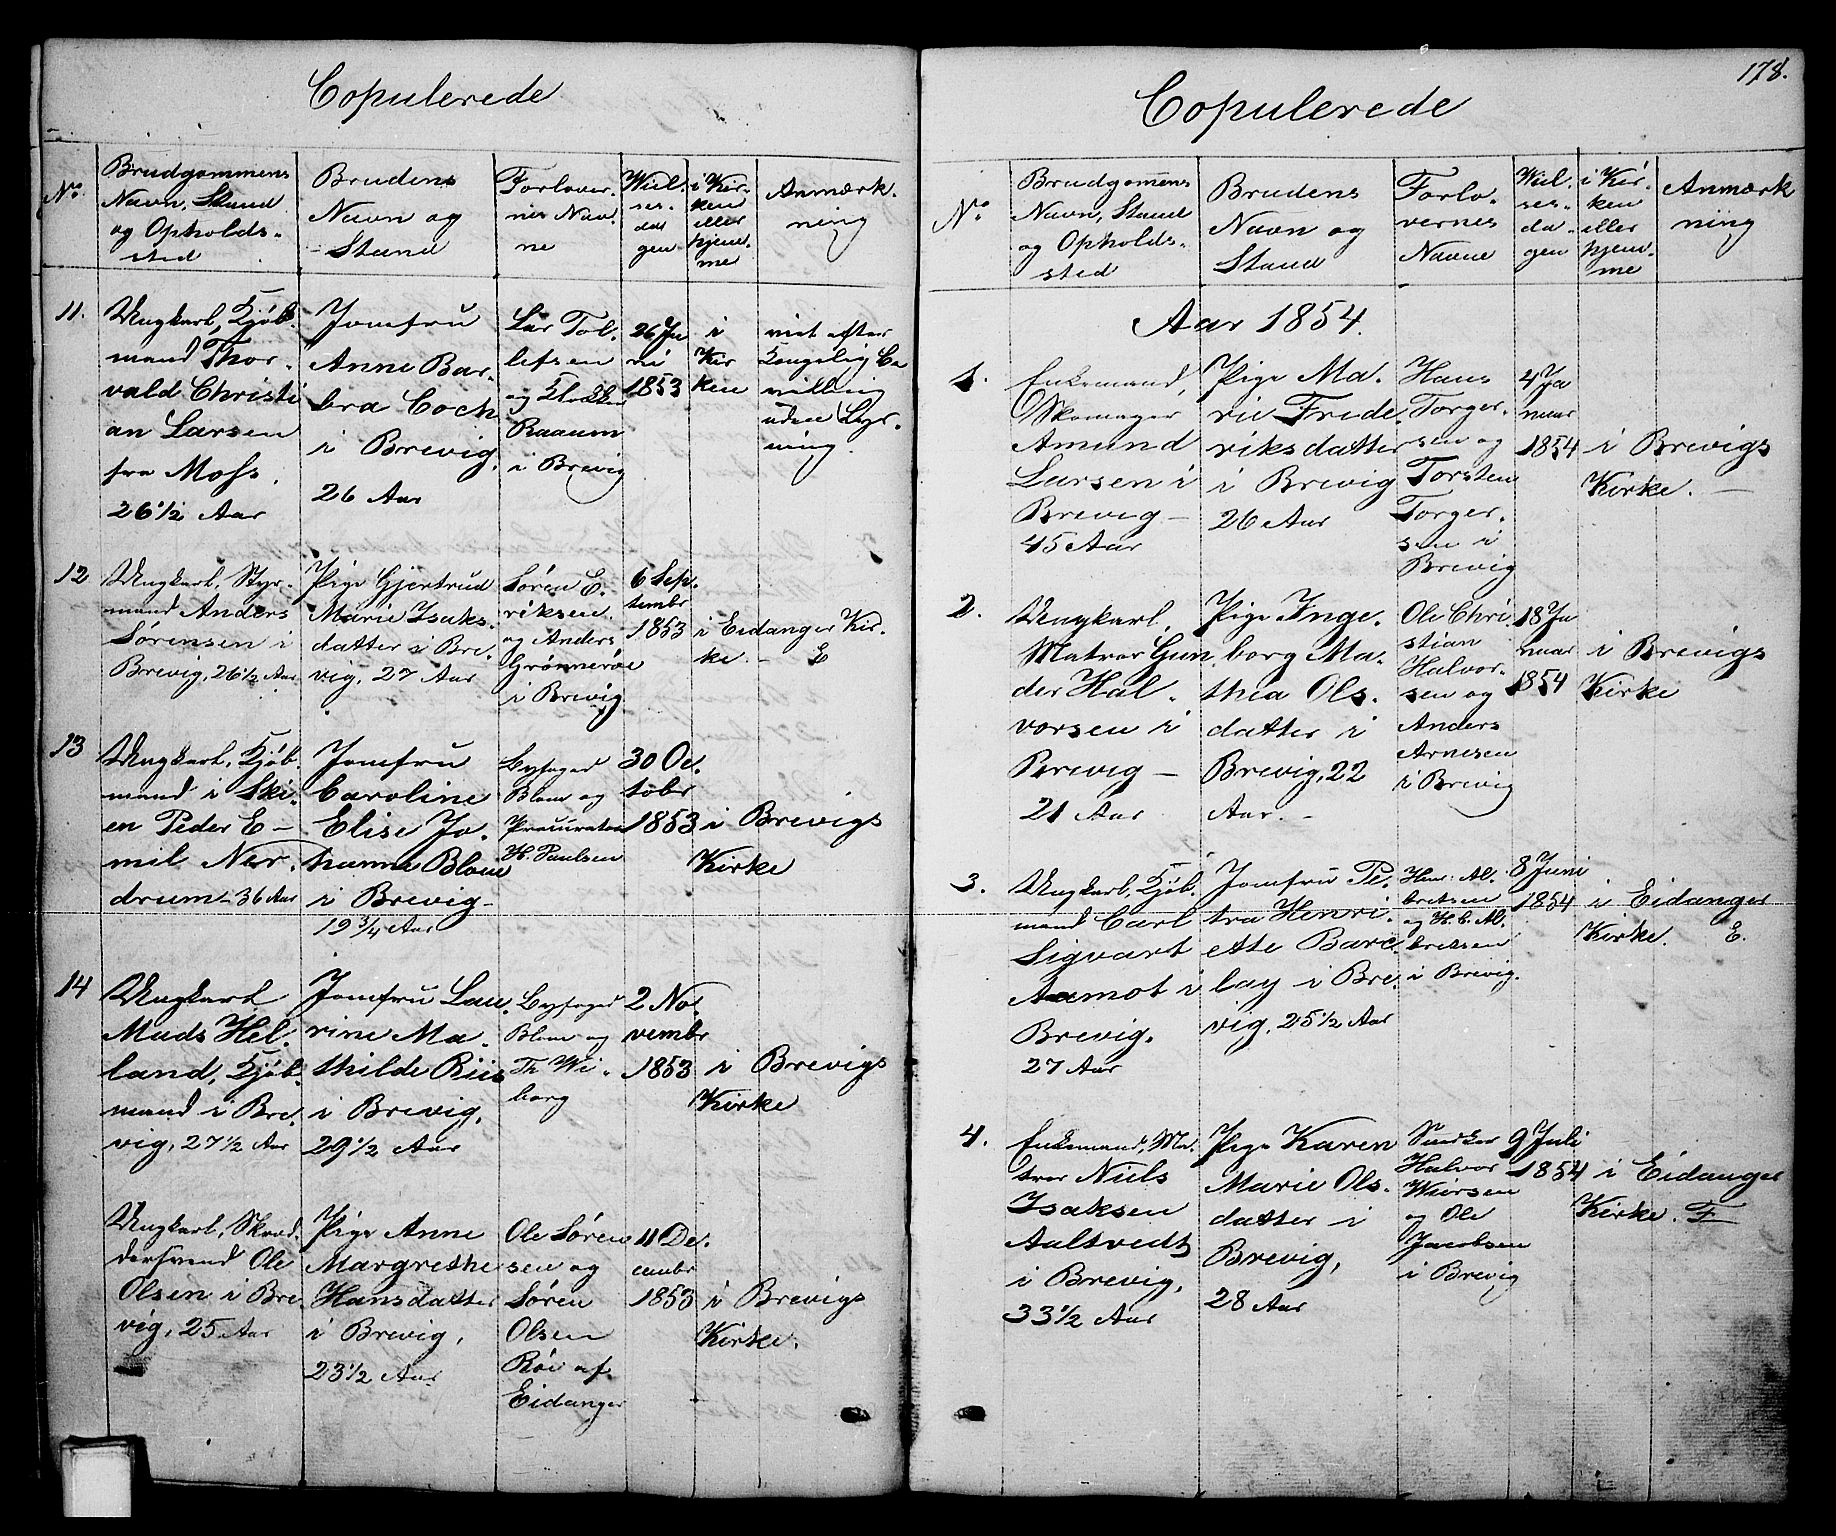 SAKO, Brevik kirkebøker, G/Ga/L0002: Klokkerbok nr. 2, 1846-1865, s. 178